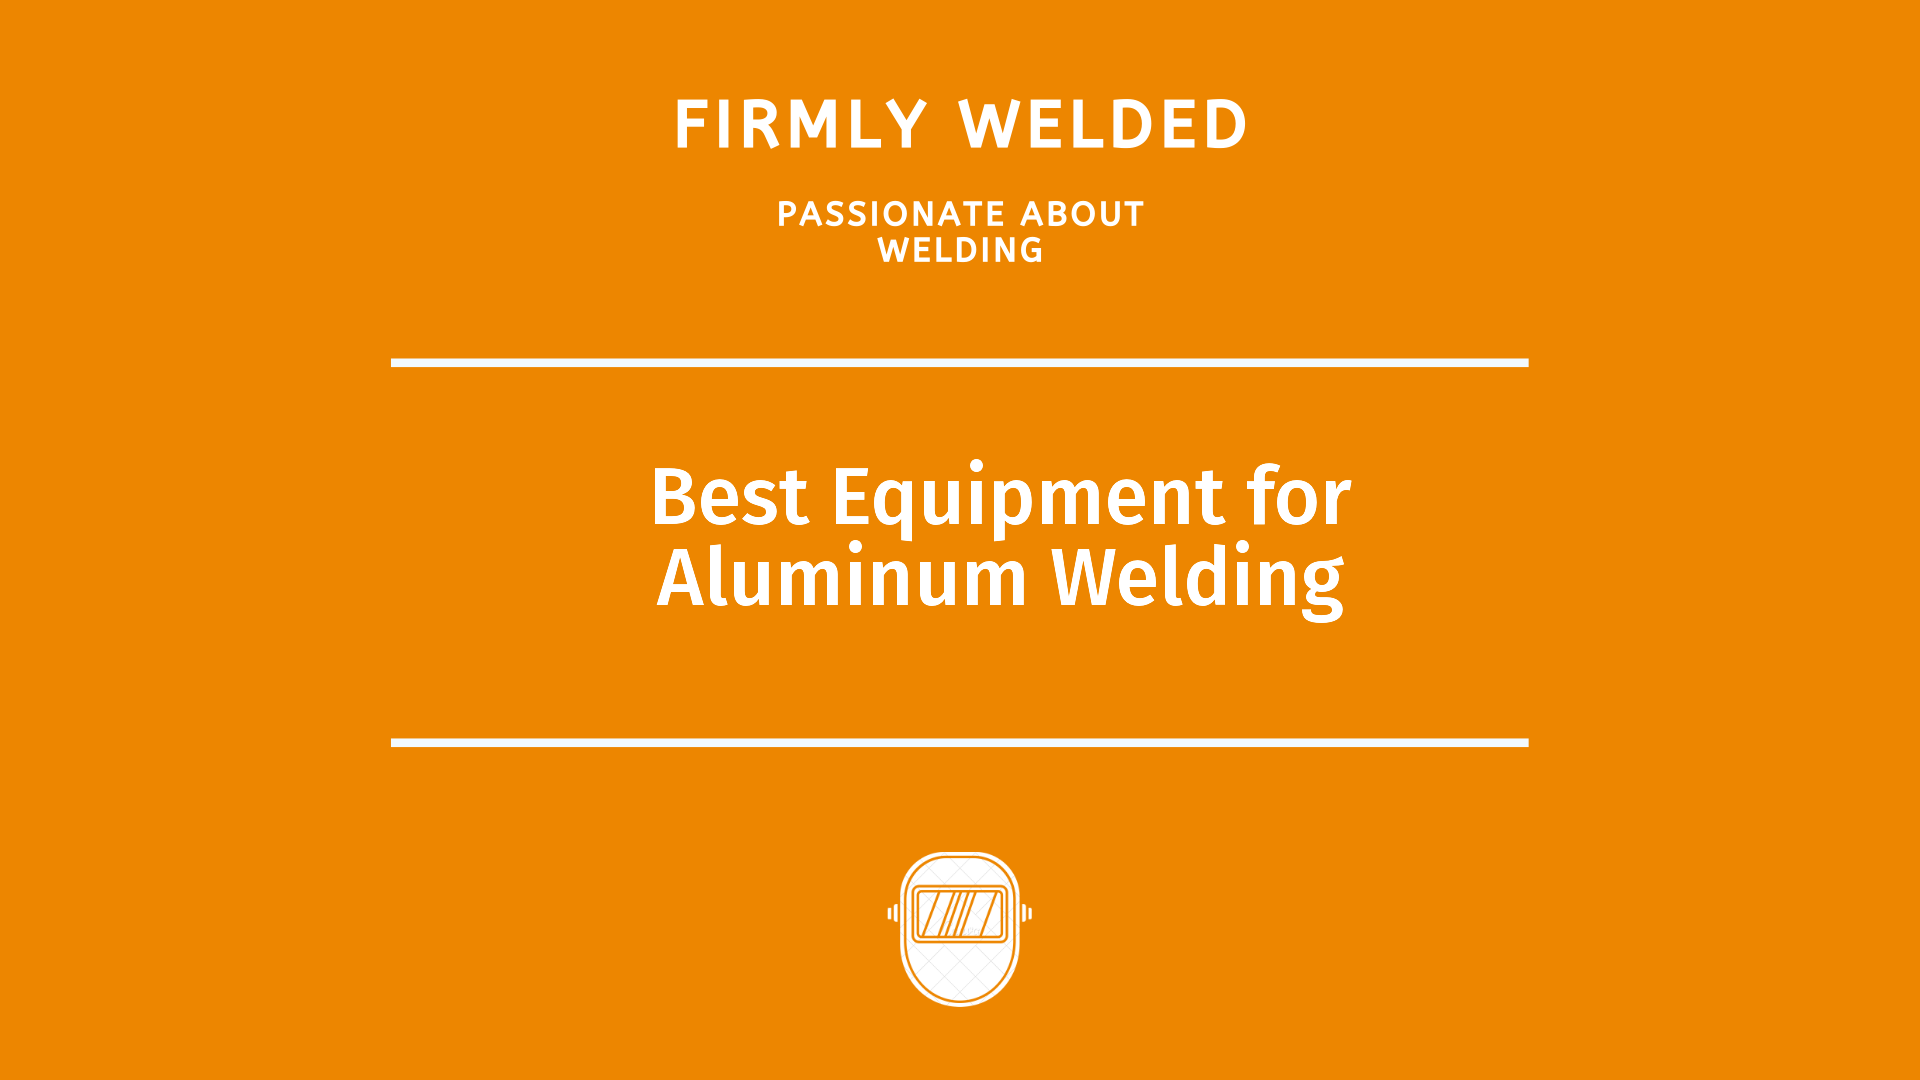 Best Equipment for Aluminum Welding